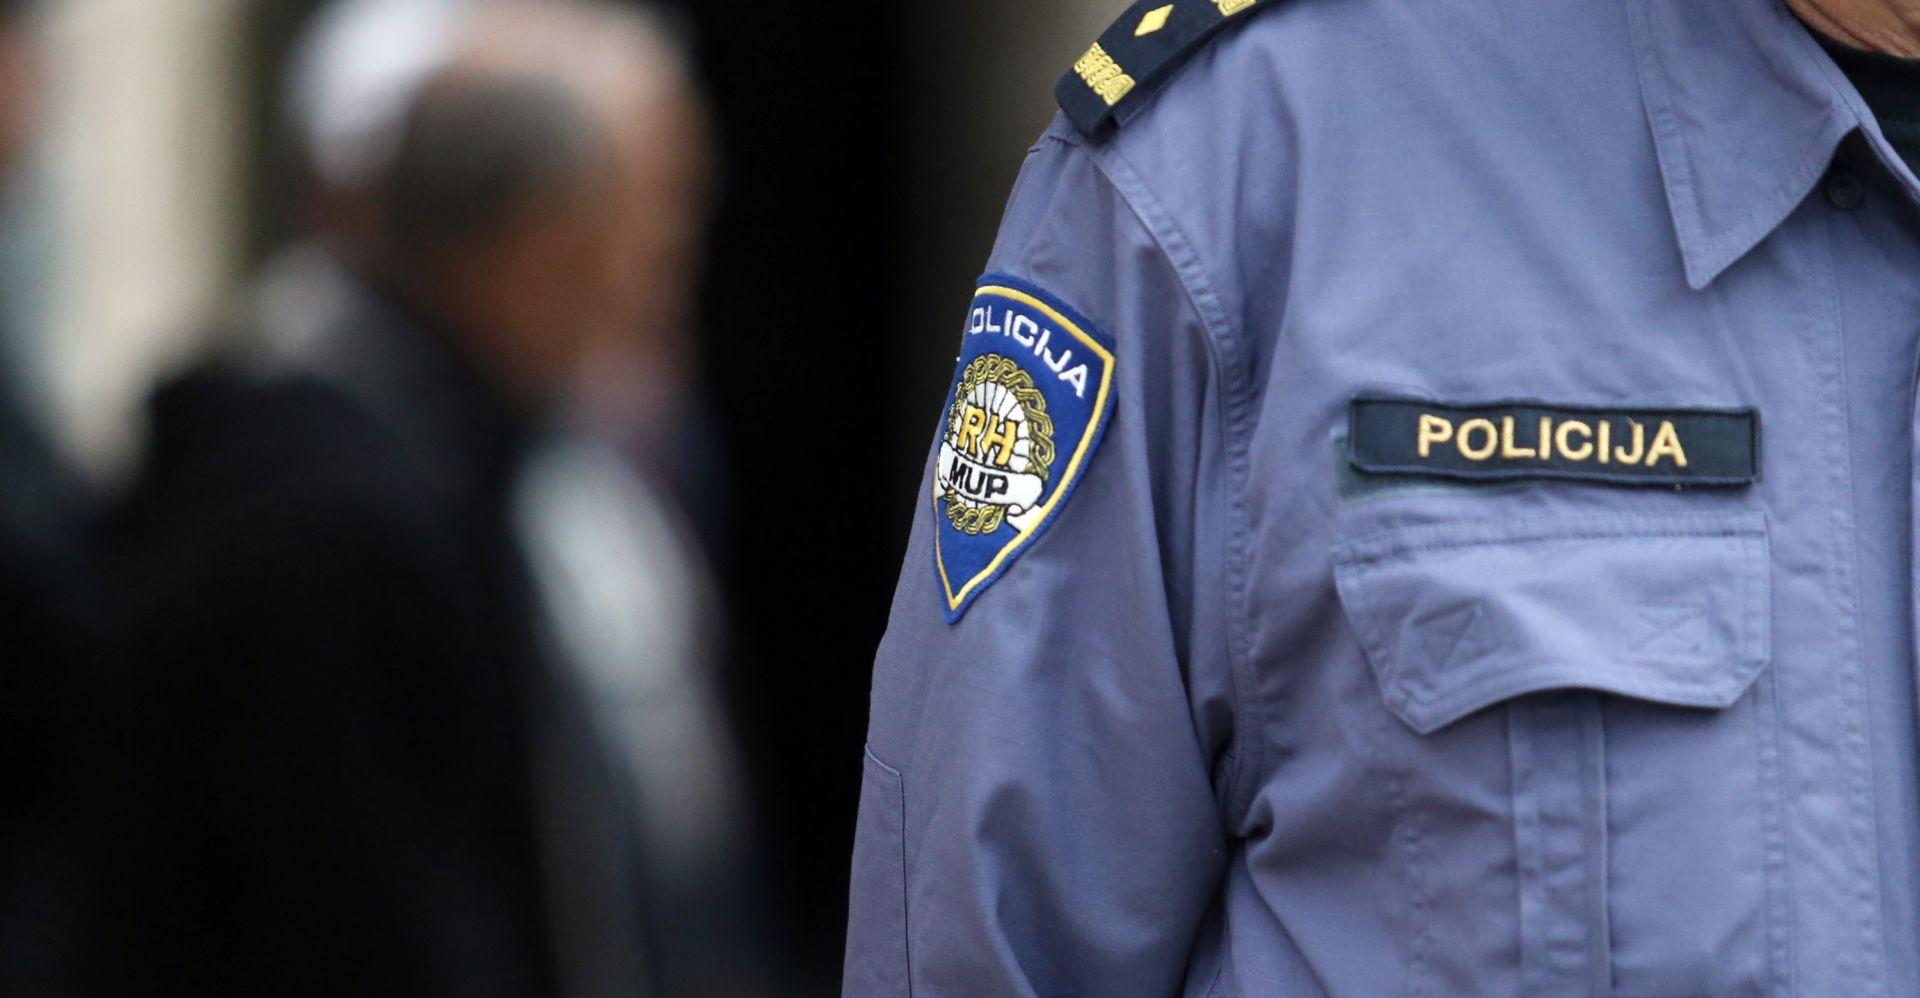 Sindikat policijskih službenika osuđuje zloporabu sindikalnog imuniteta